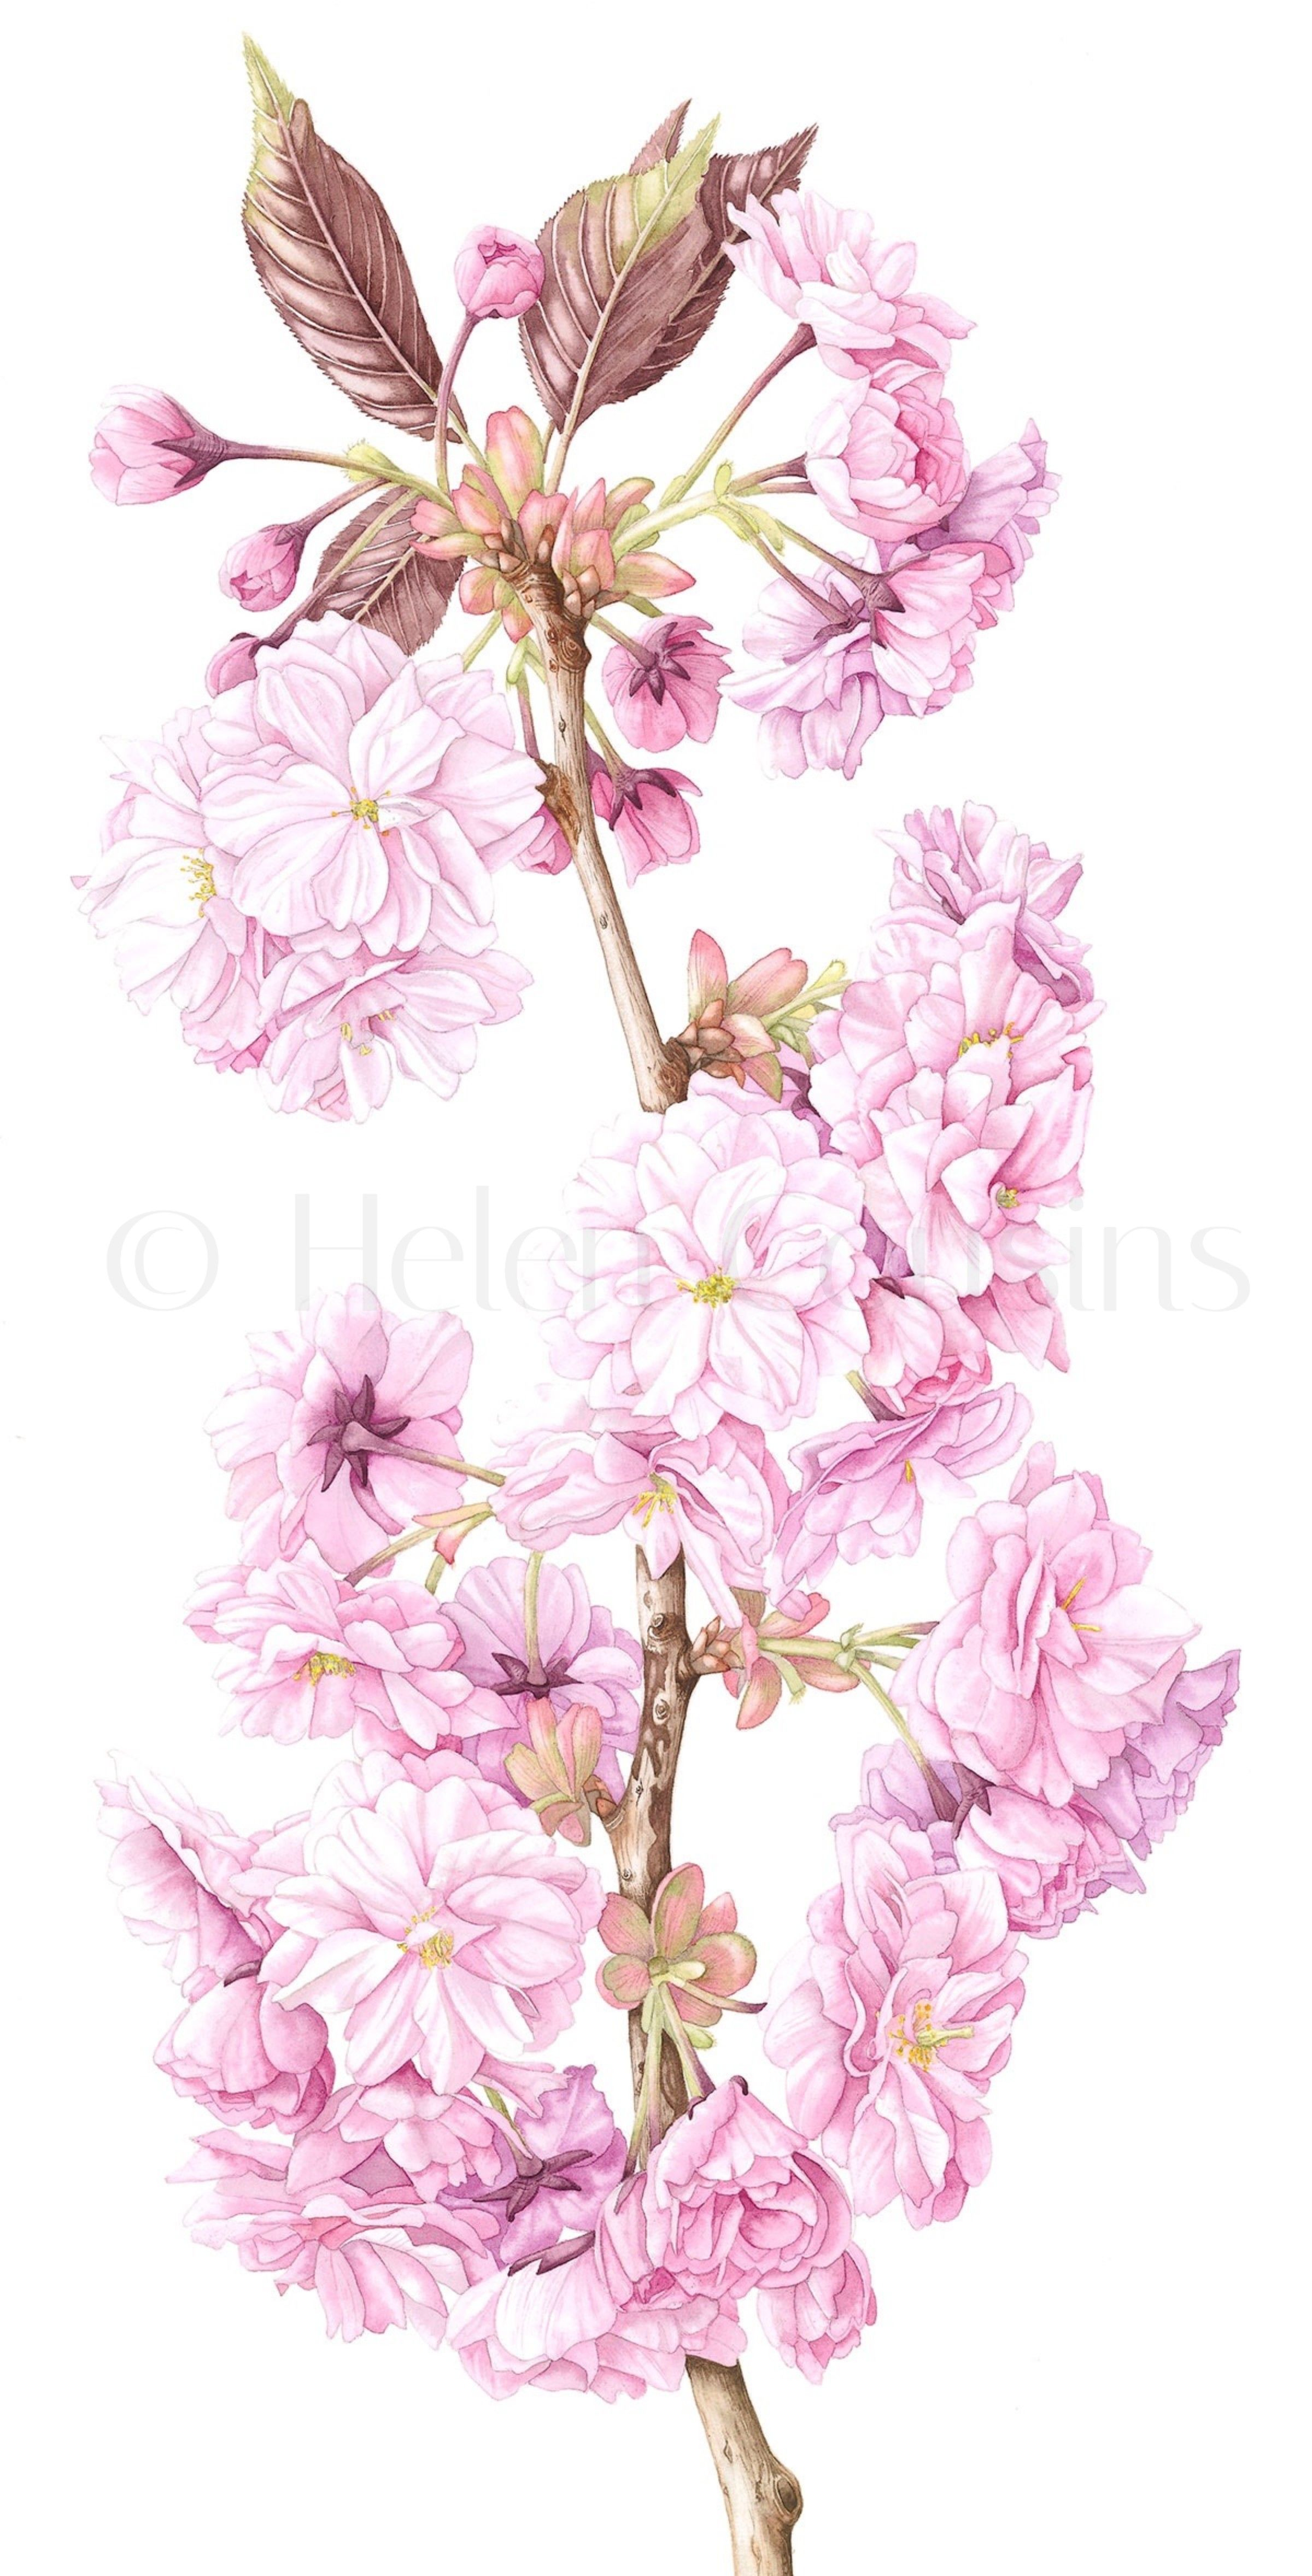 Cherry Blossom Cropped Helen Cousins Botanics Cherry Blossom Watercolor Cherry Blossom Drawing Cherry Blossoms Illustration